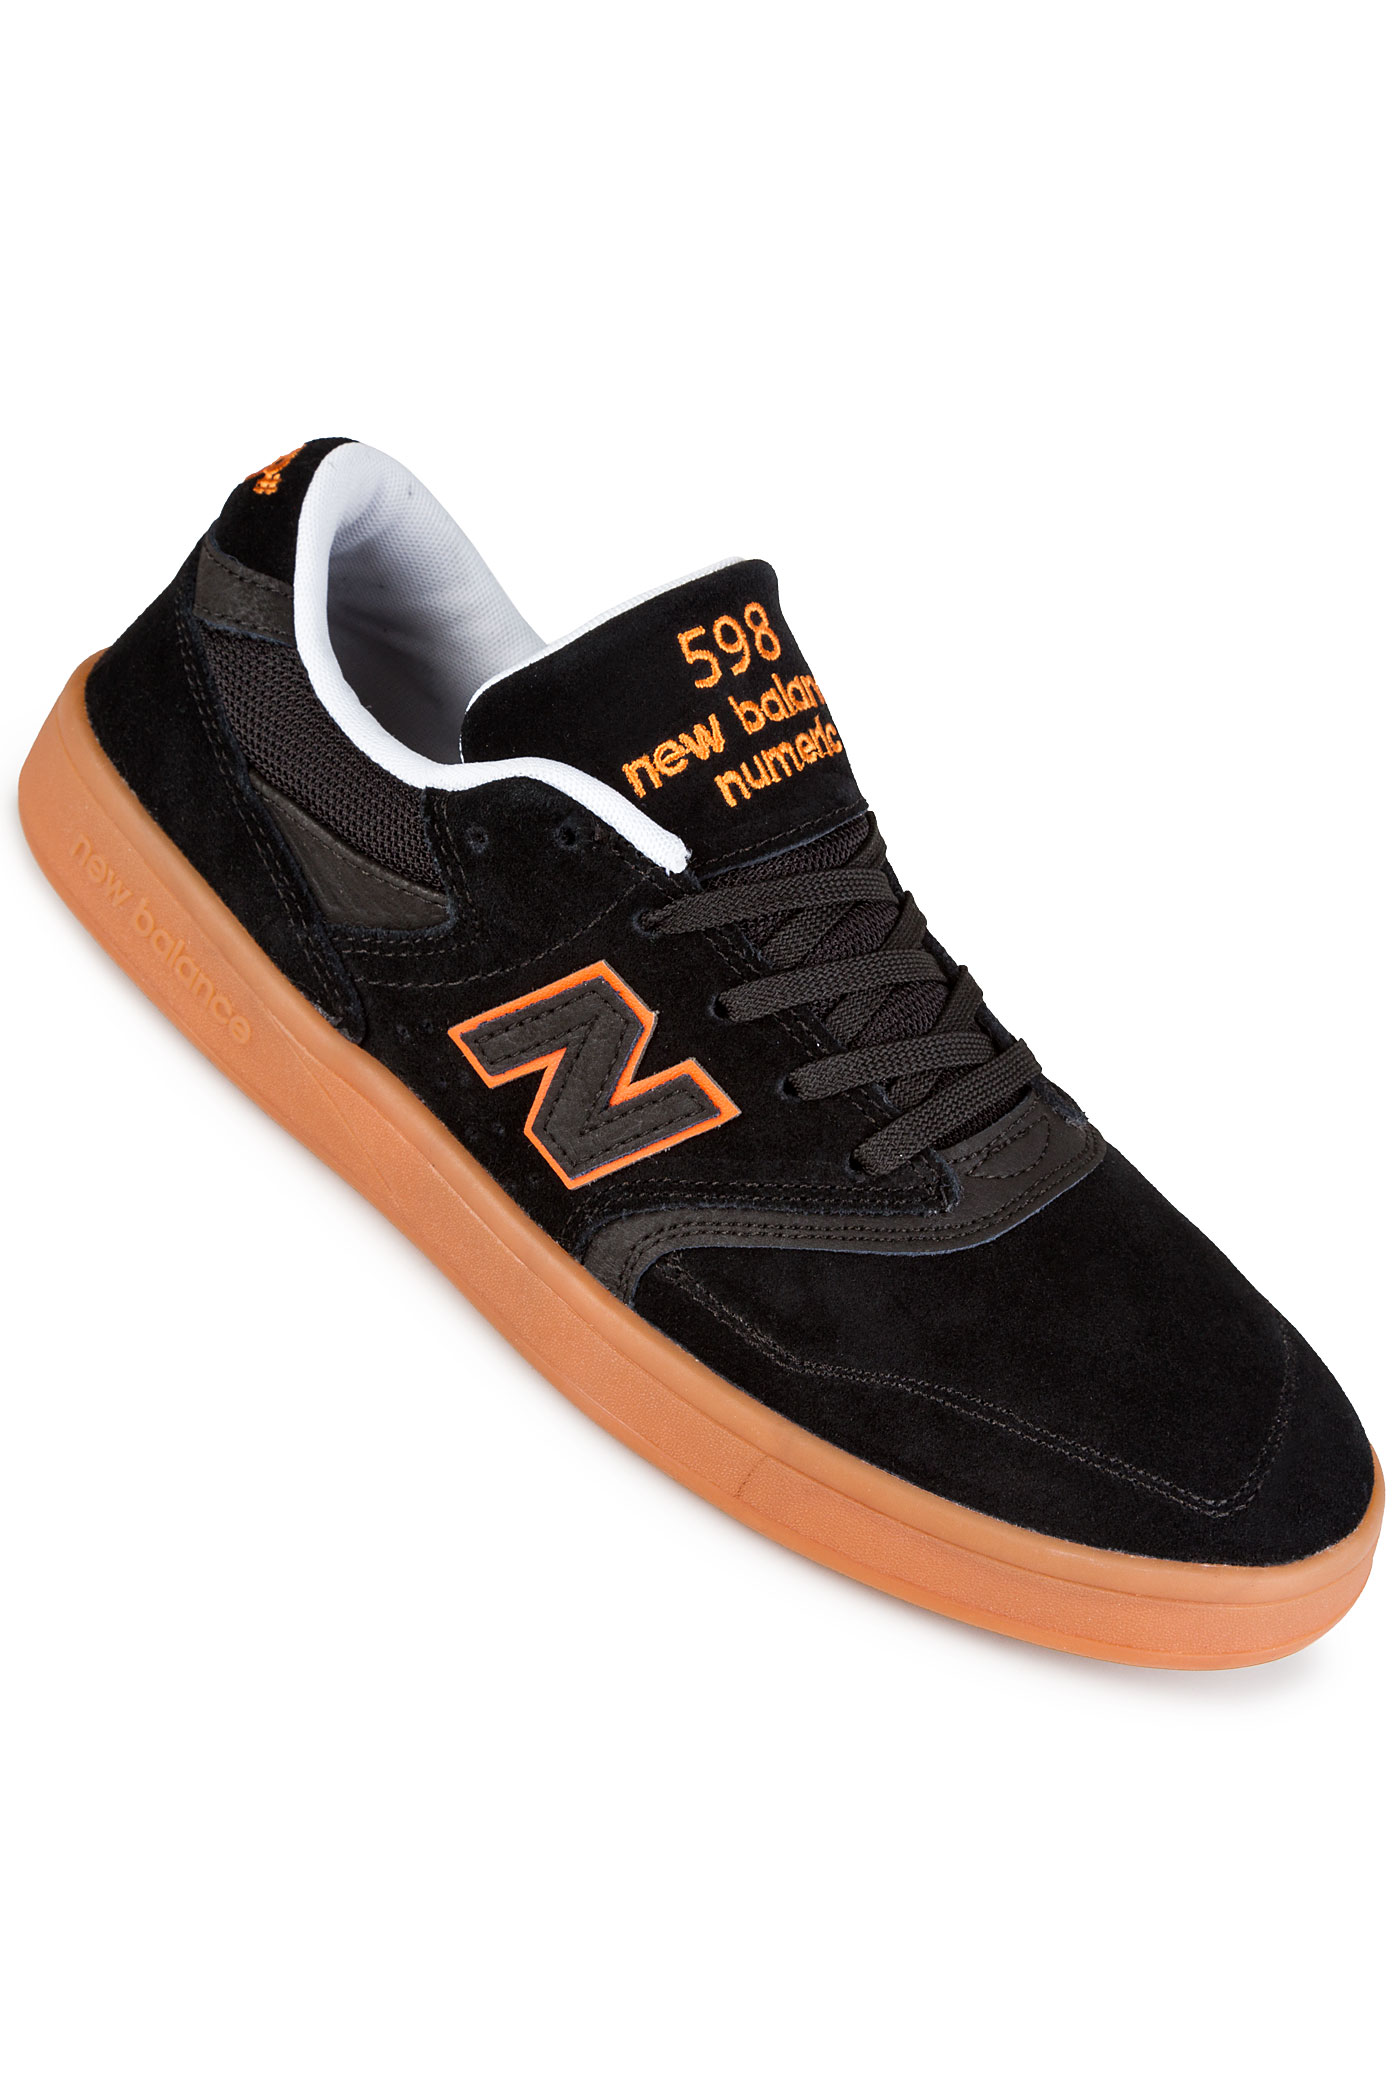 598 new balance